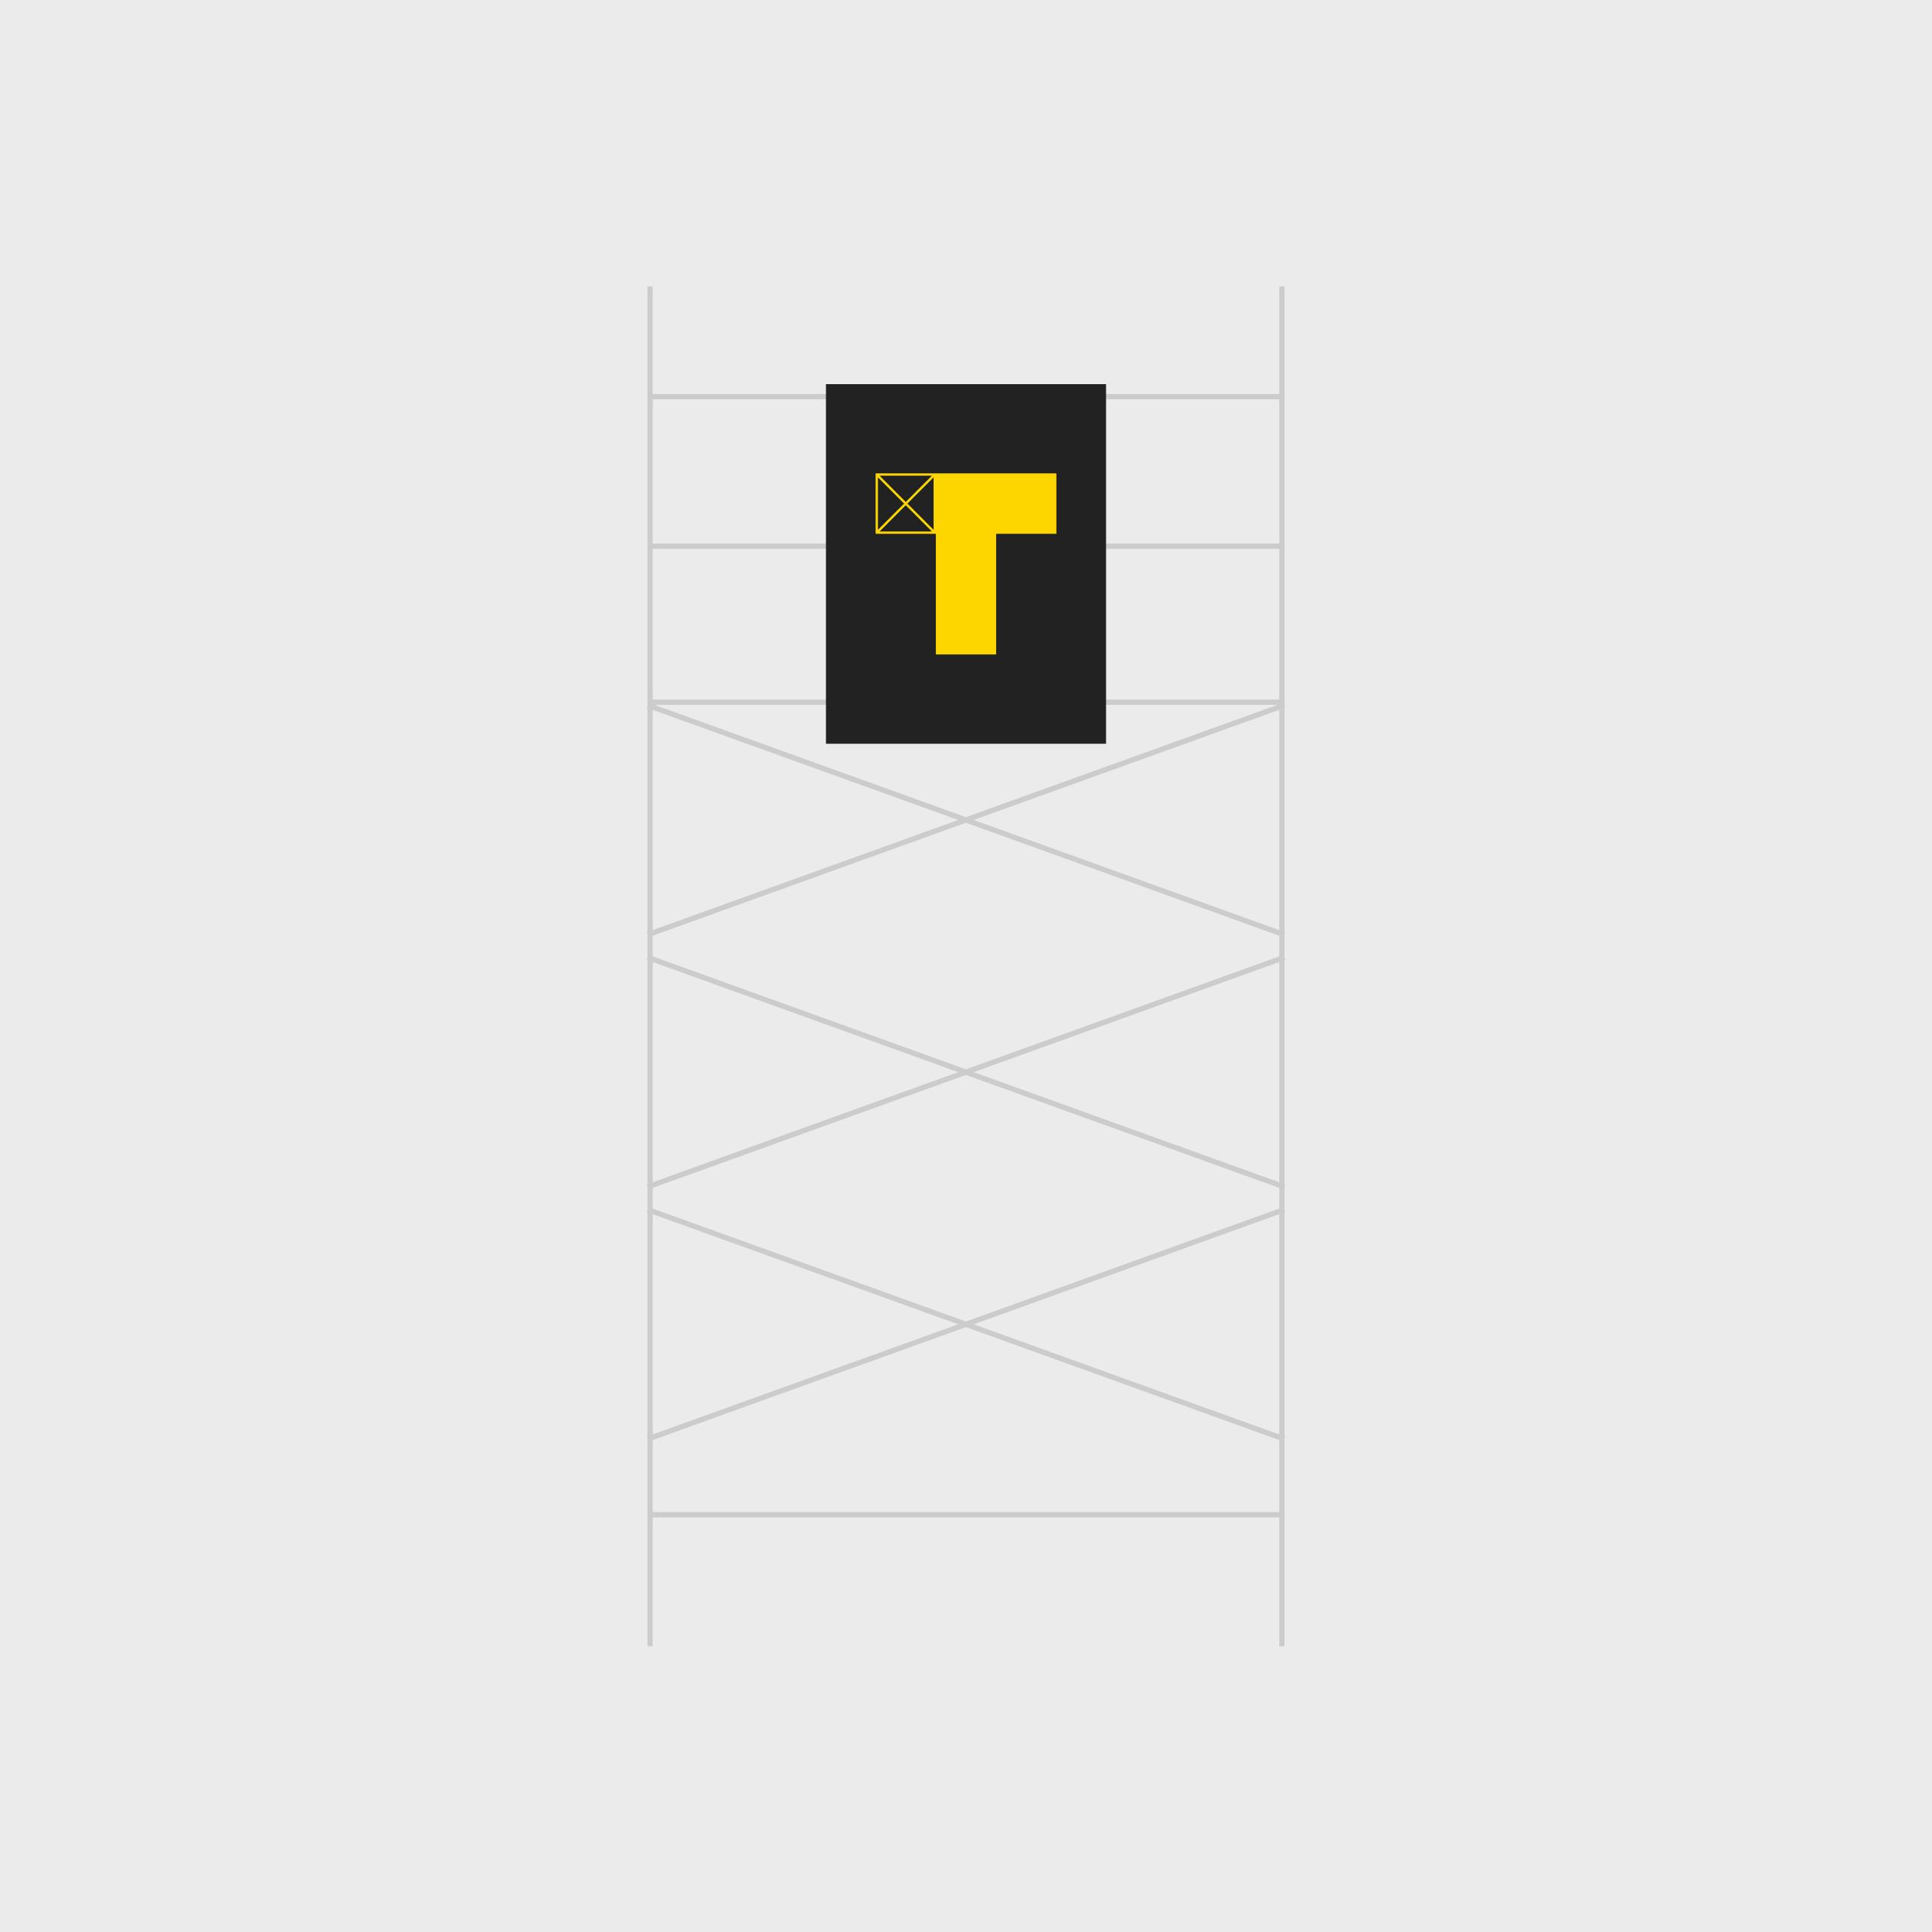 teform-vertical-2